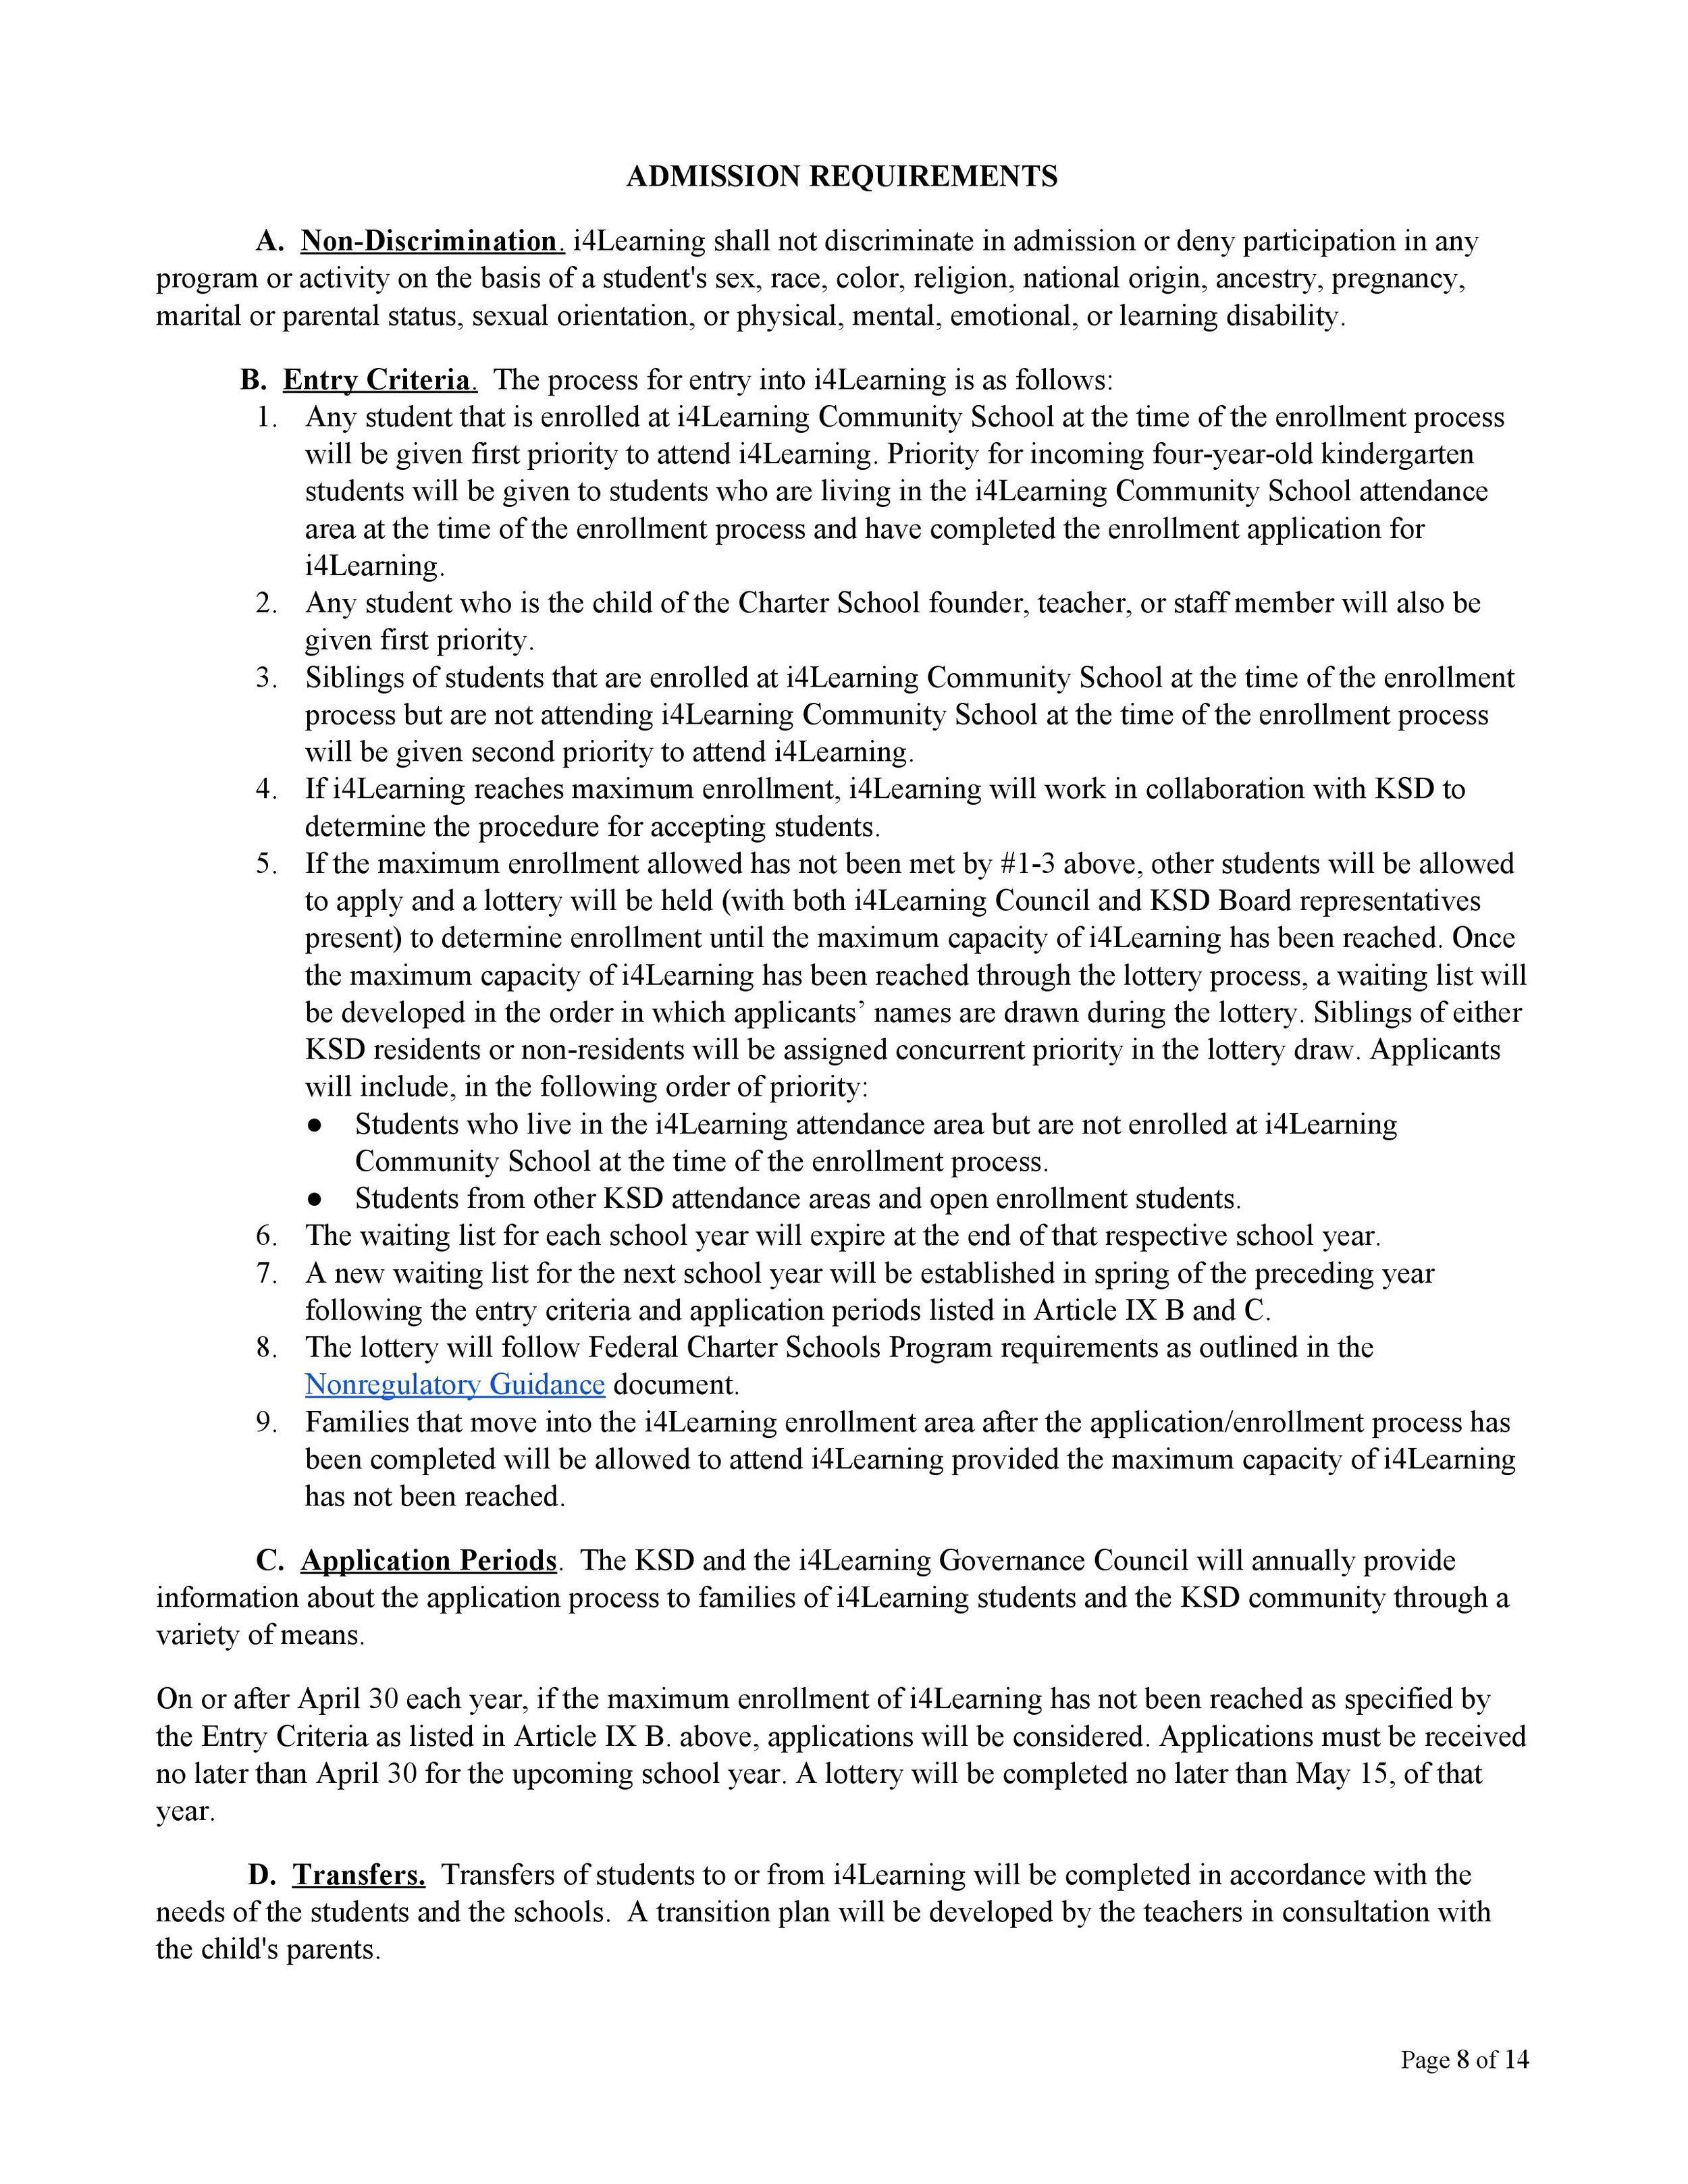 Contract pg 8.jpg